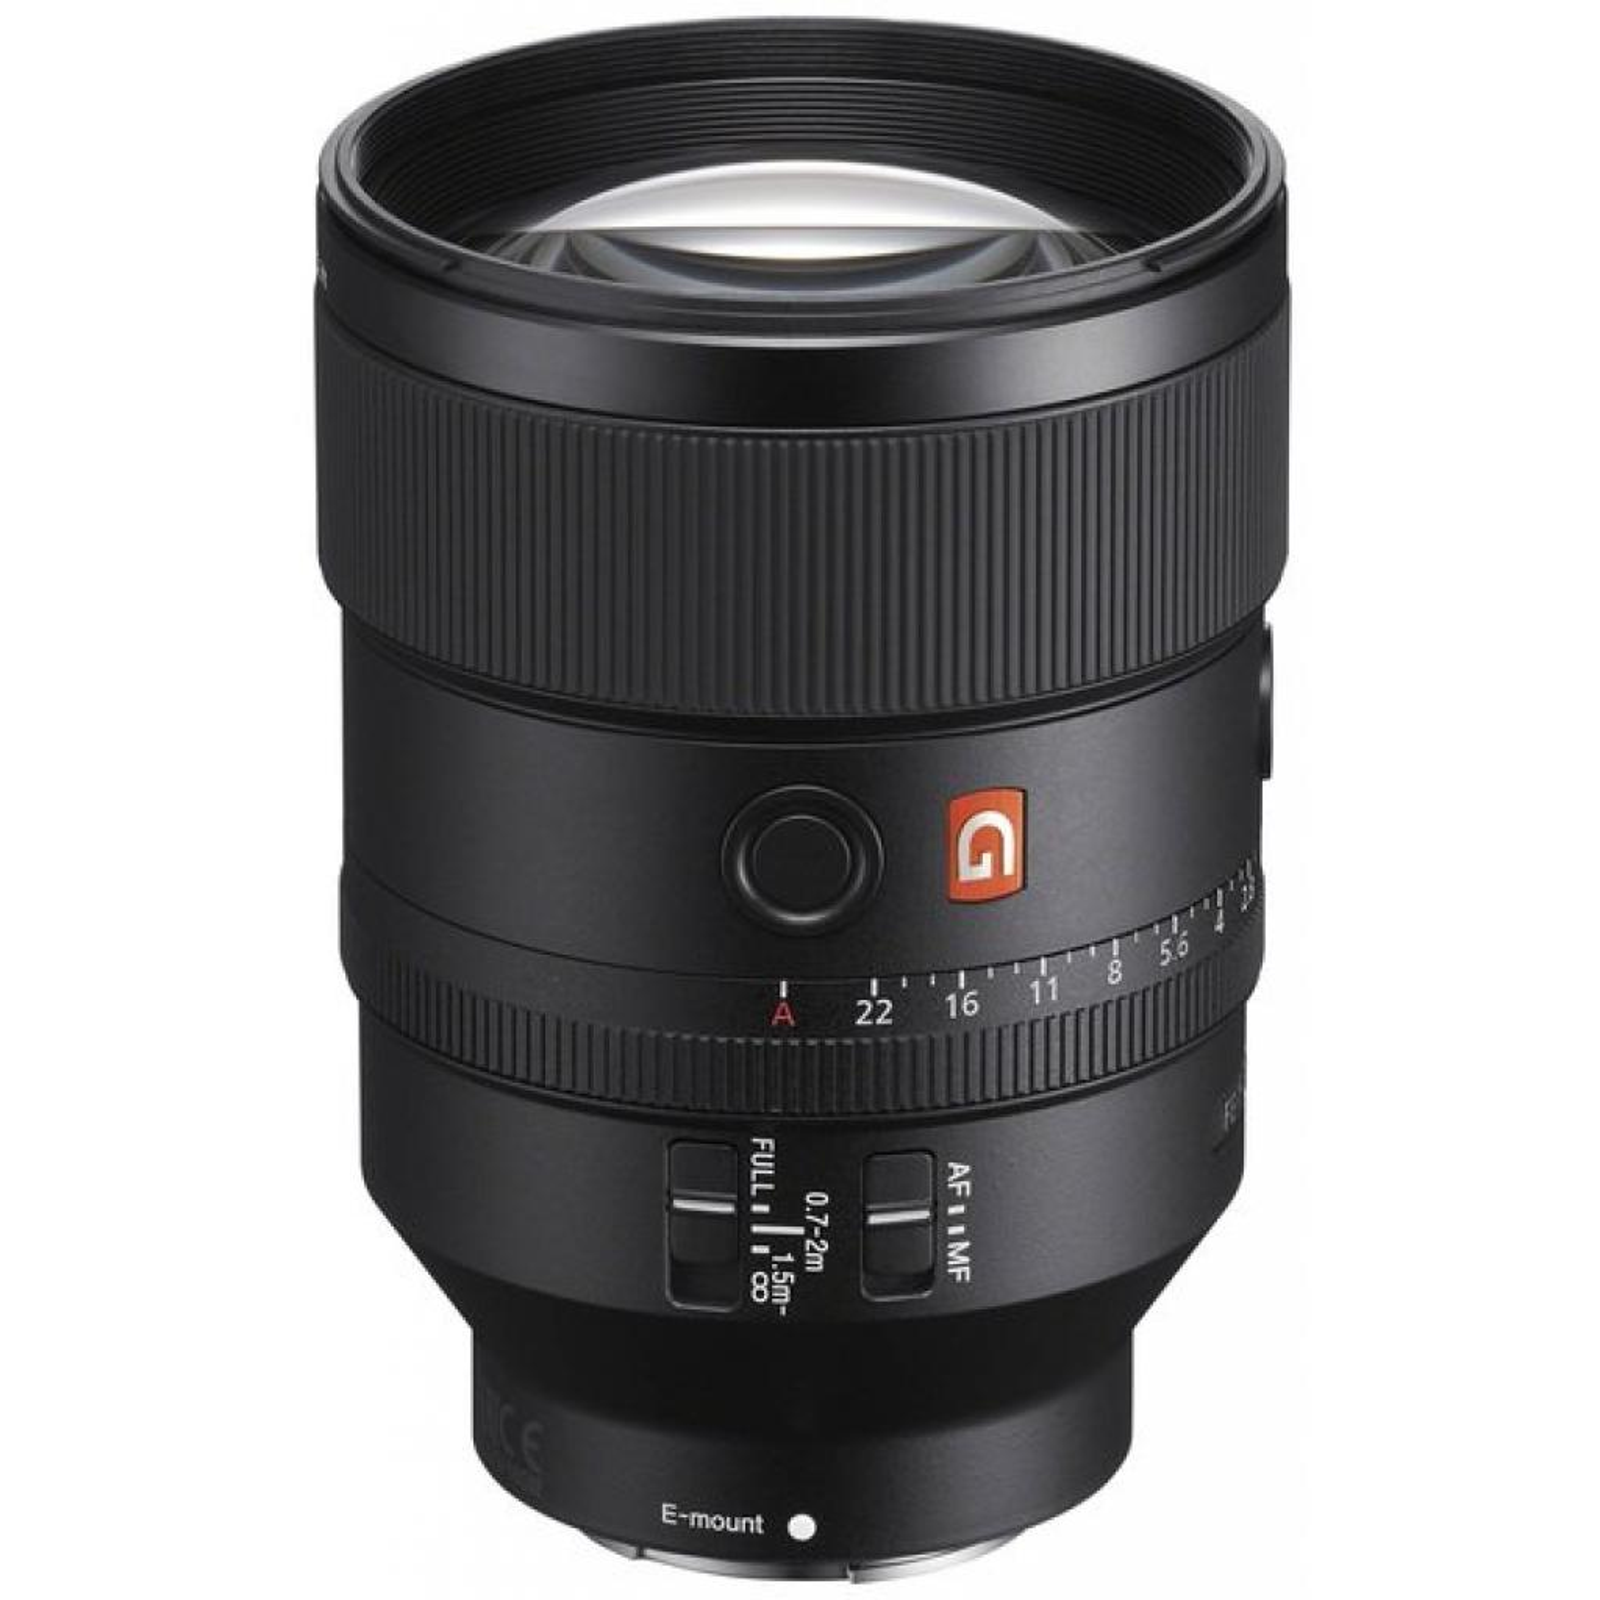 Объектив Sony 135mm, f/1.8 GM для камер NEX FF (SEL135F18GM.SYX) изображение 2